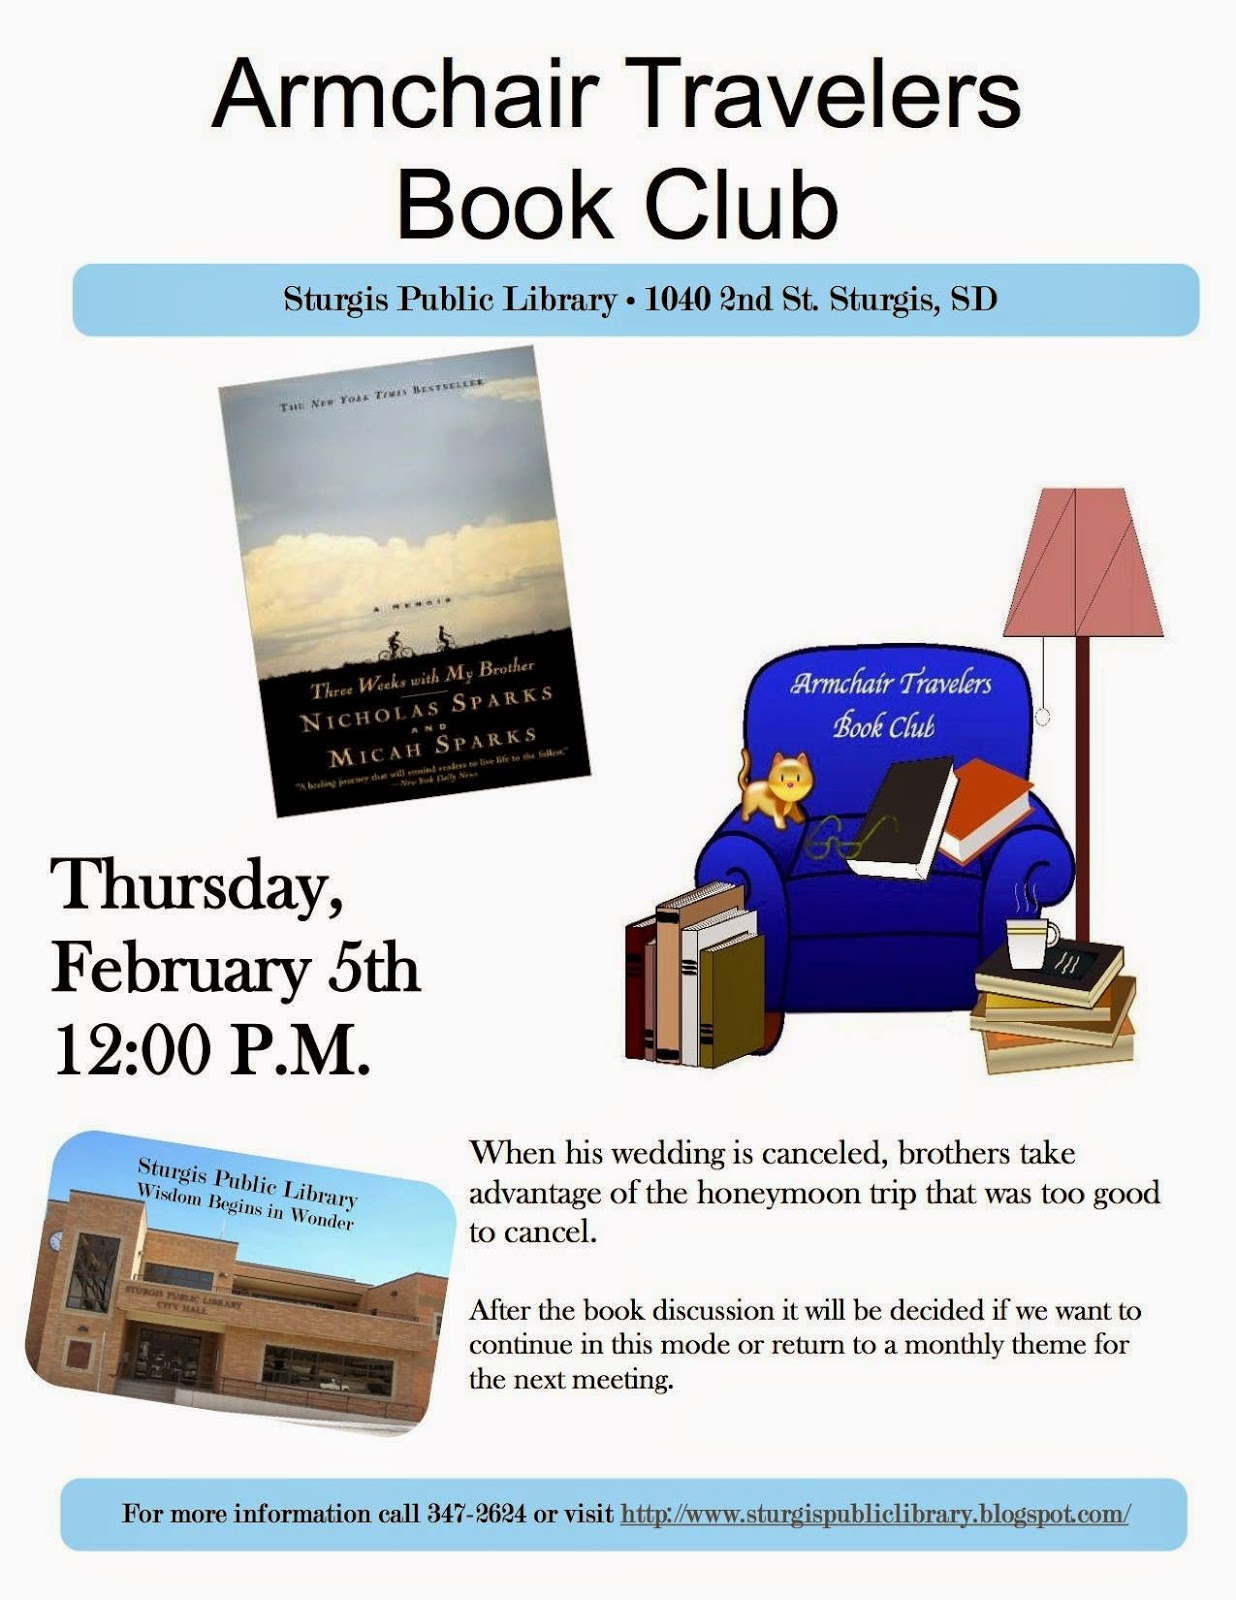 Sturgis Public Library: Armchair Travelers Book Club ...